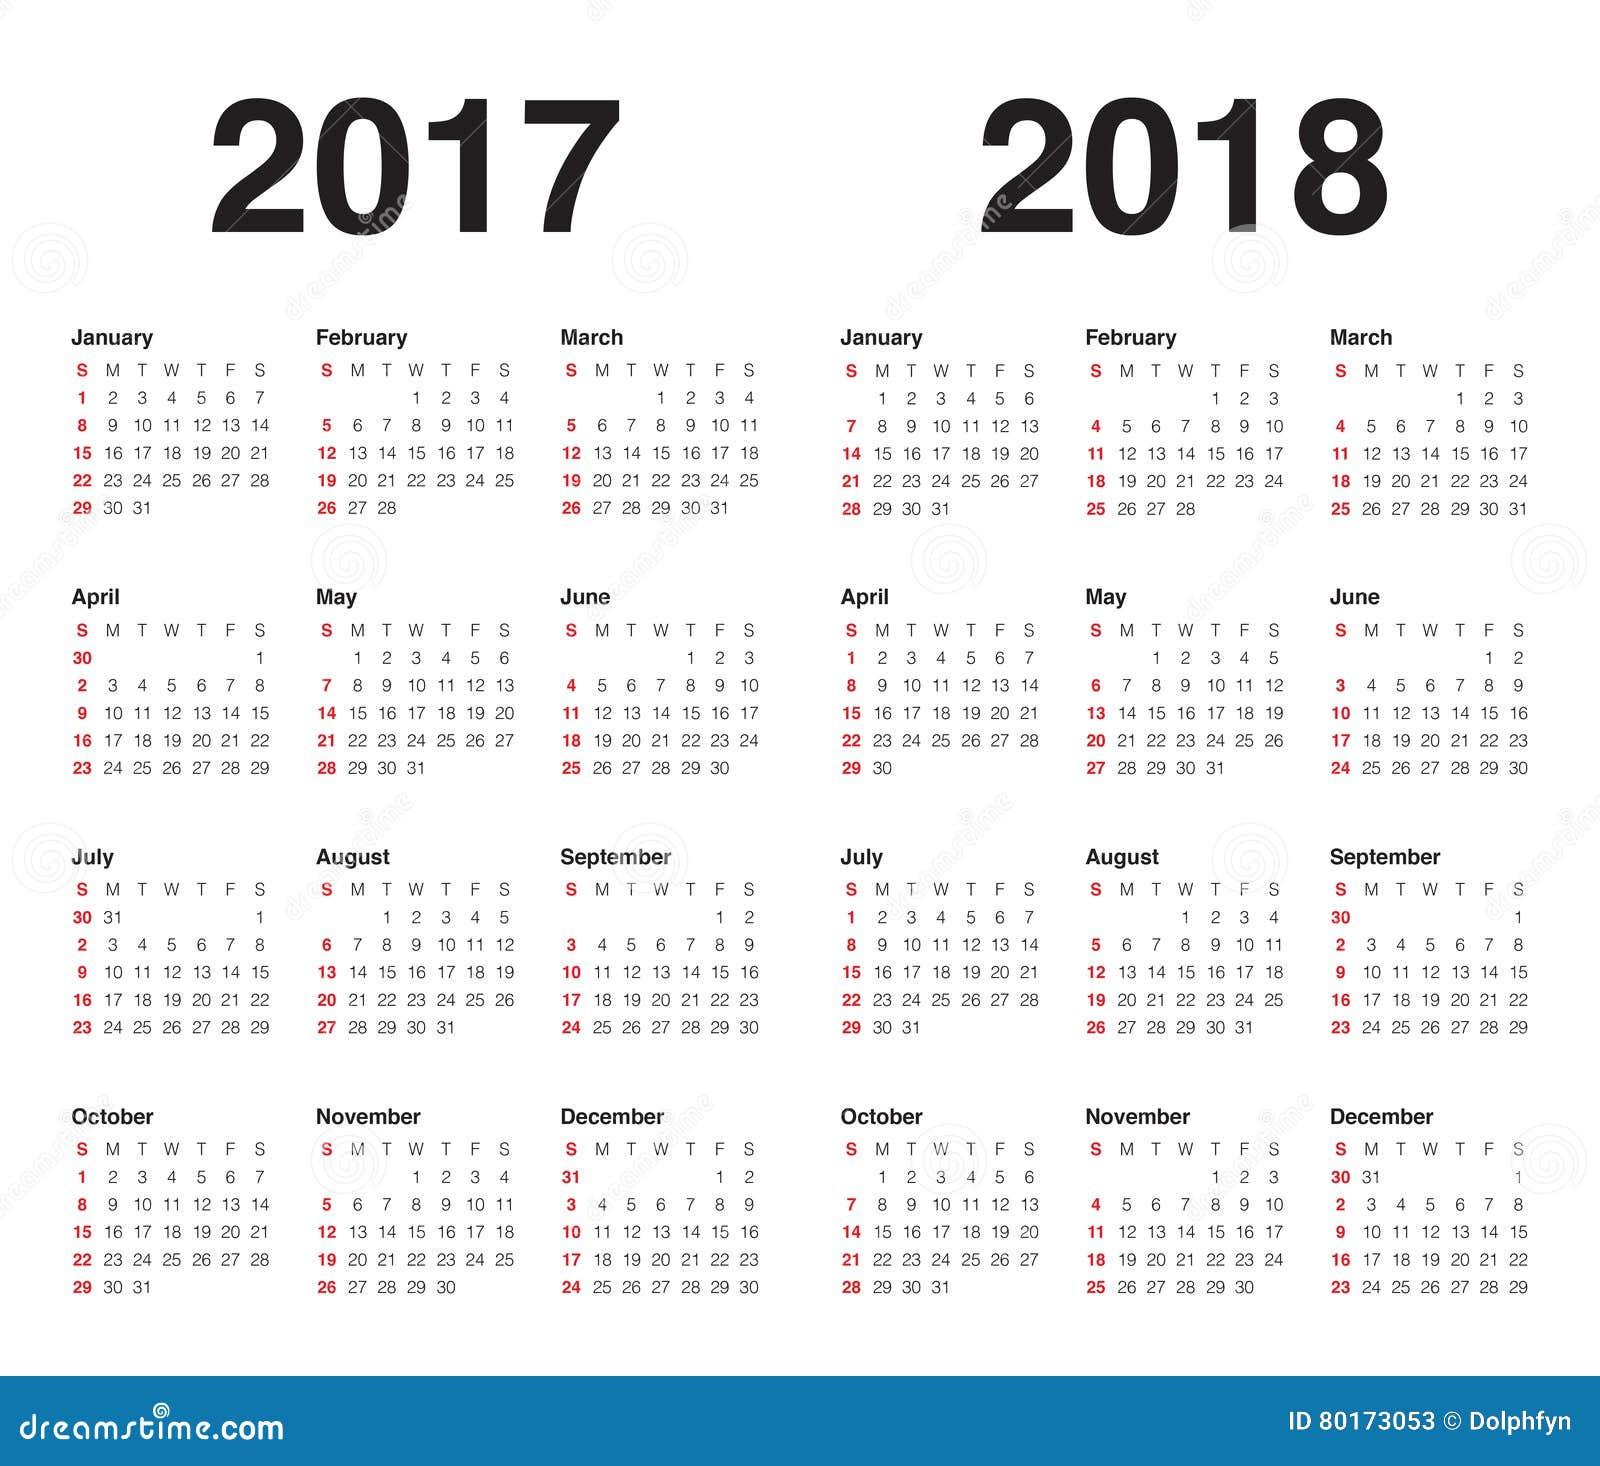 Календари на июнь 2017-2018